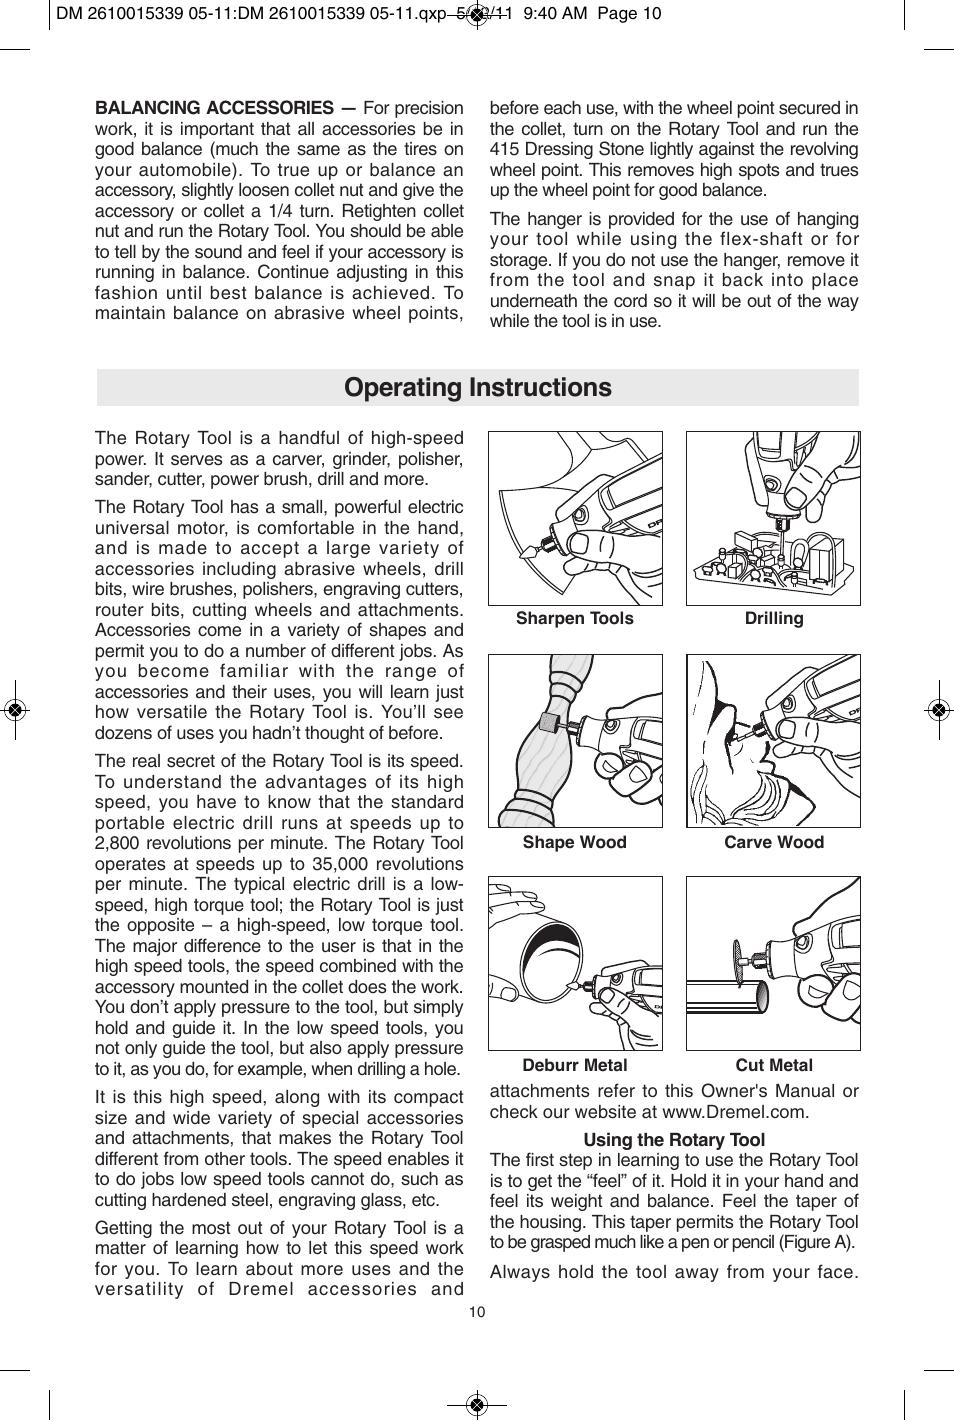 operating instructions dremel 3000 user manual page 10 68 rh manualsdir com Dremel 4000 Rotary Tool Dremel 4000 Rotary Tool